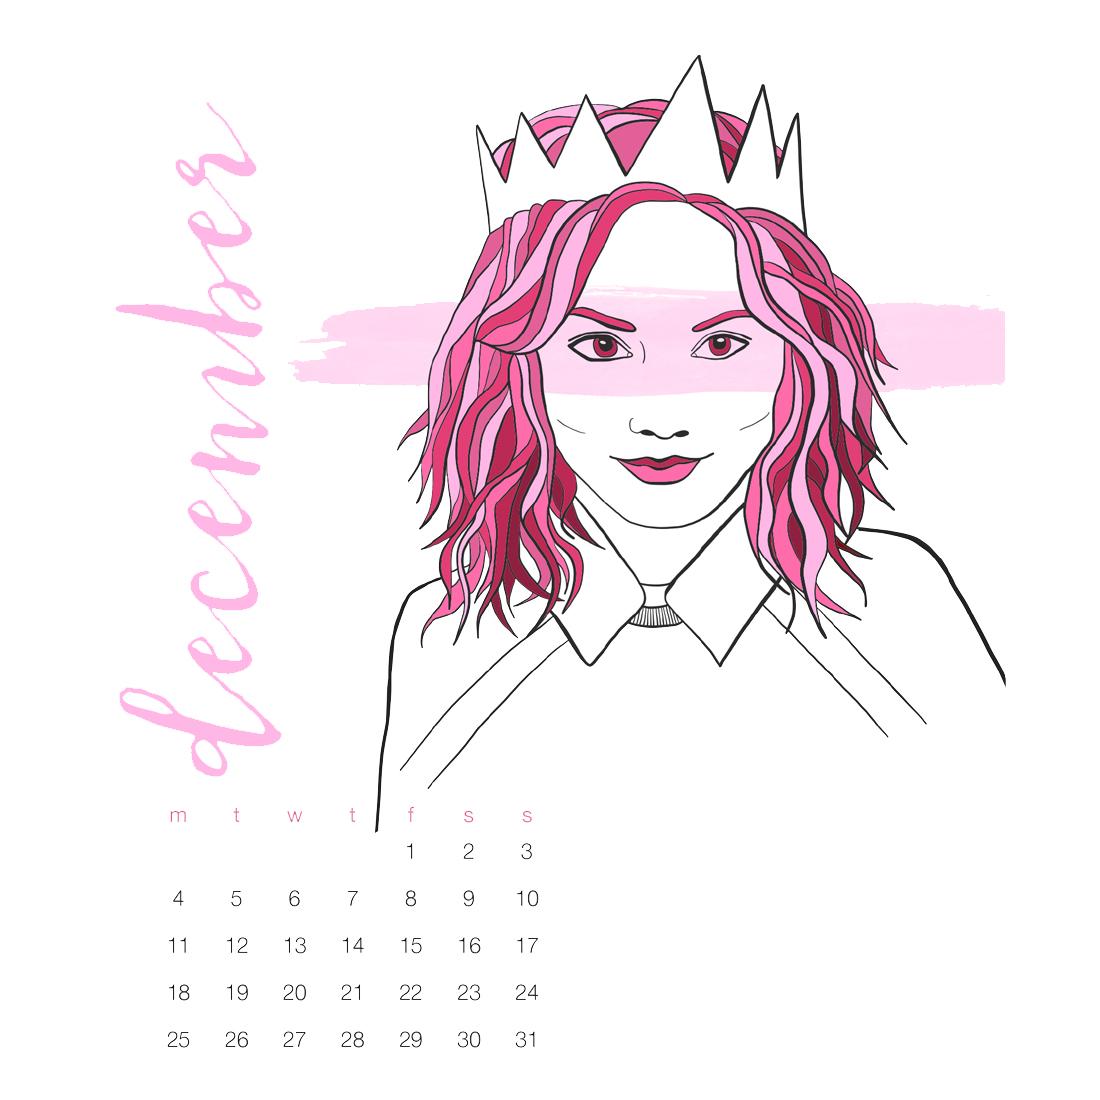 2017 Fashion Illustration Calendar by BrownPaperBunny